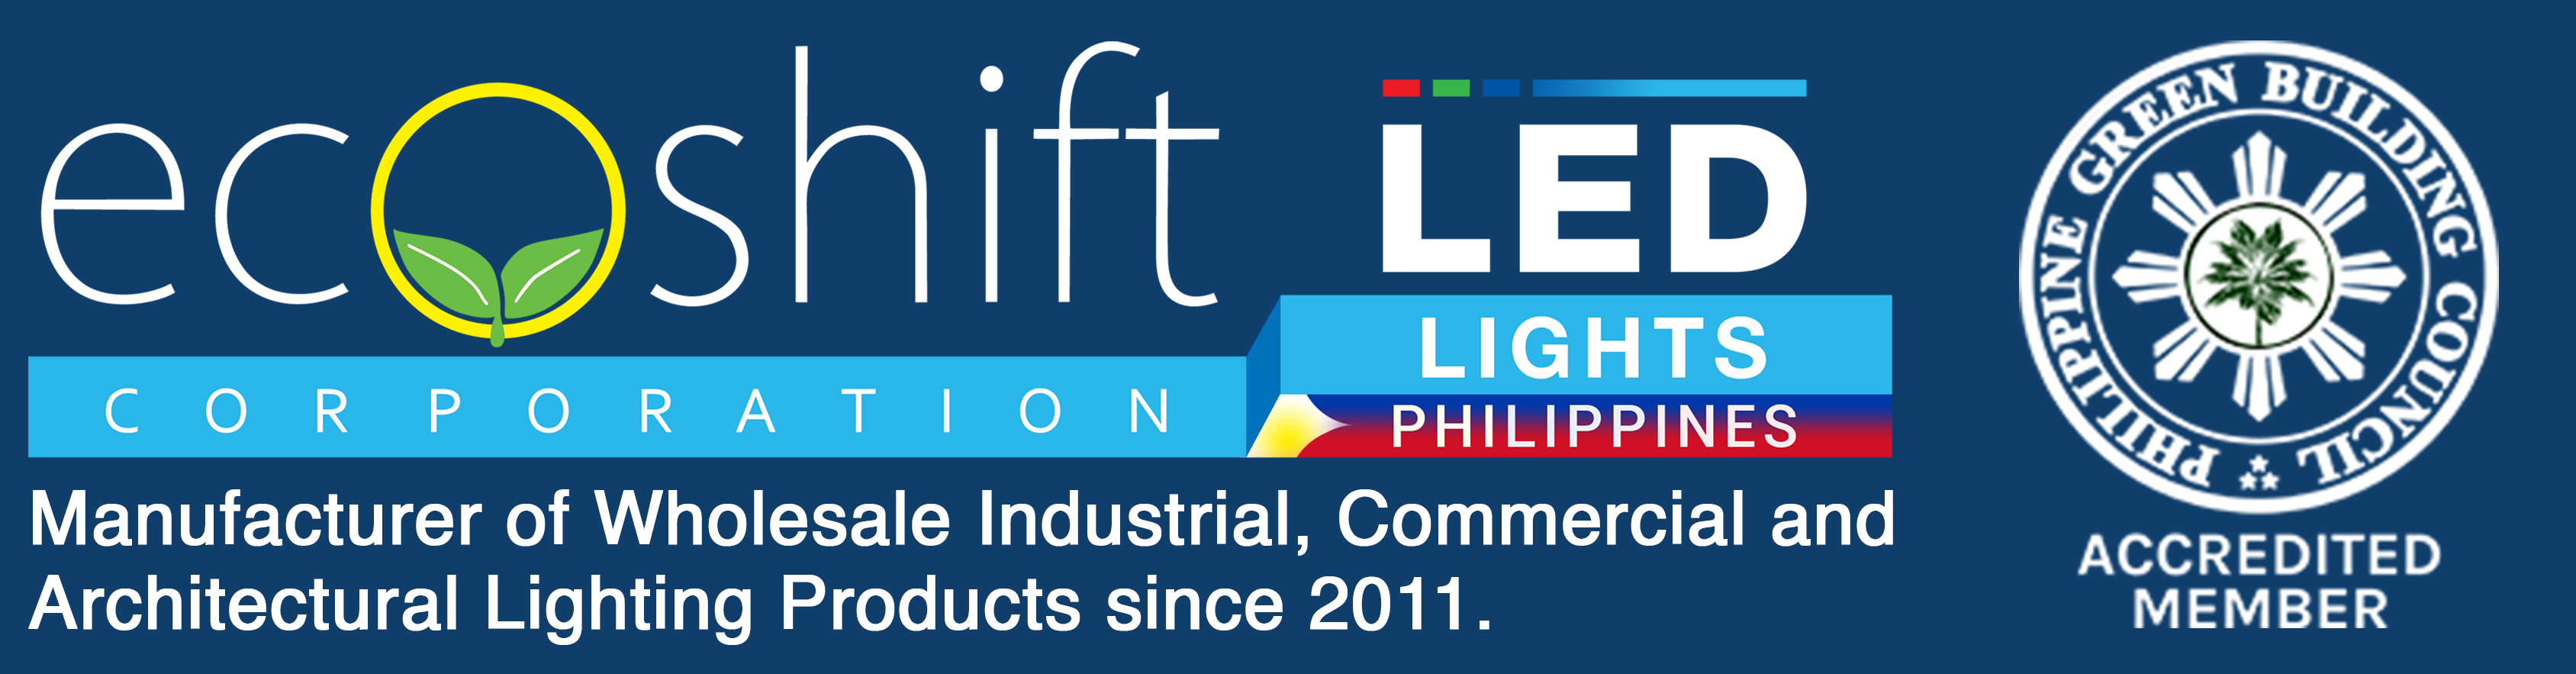 LED Lights Supplier Philippines – Ecoshift Corporation Logo